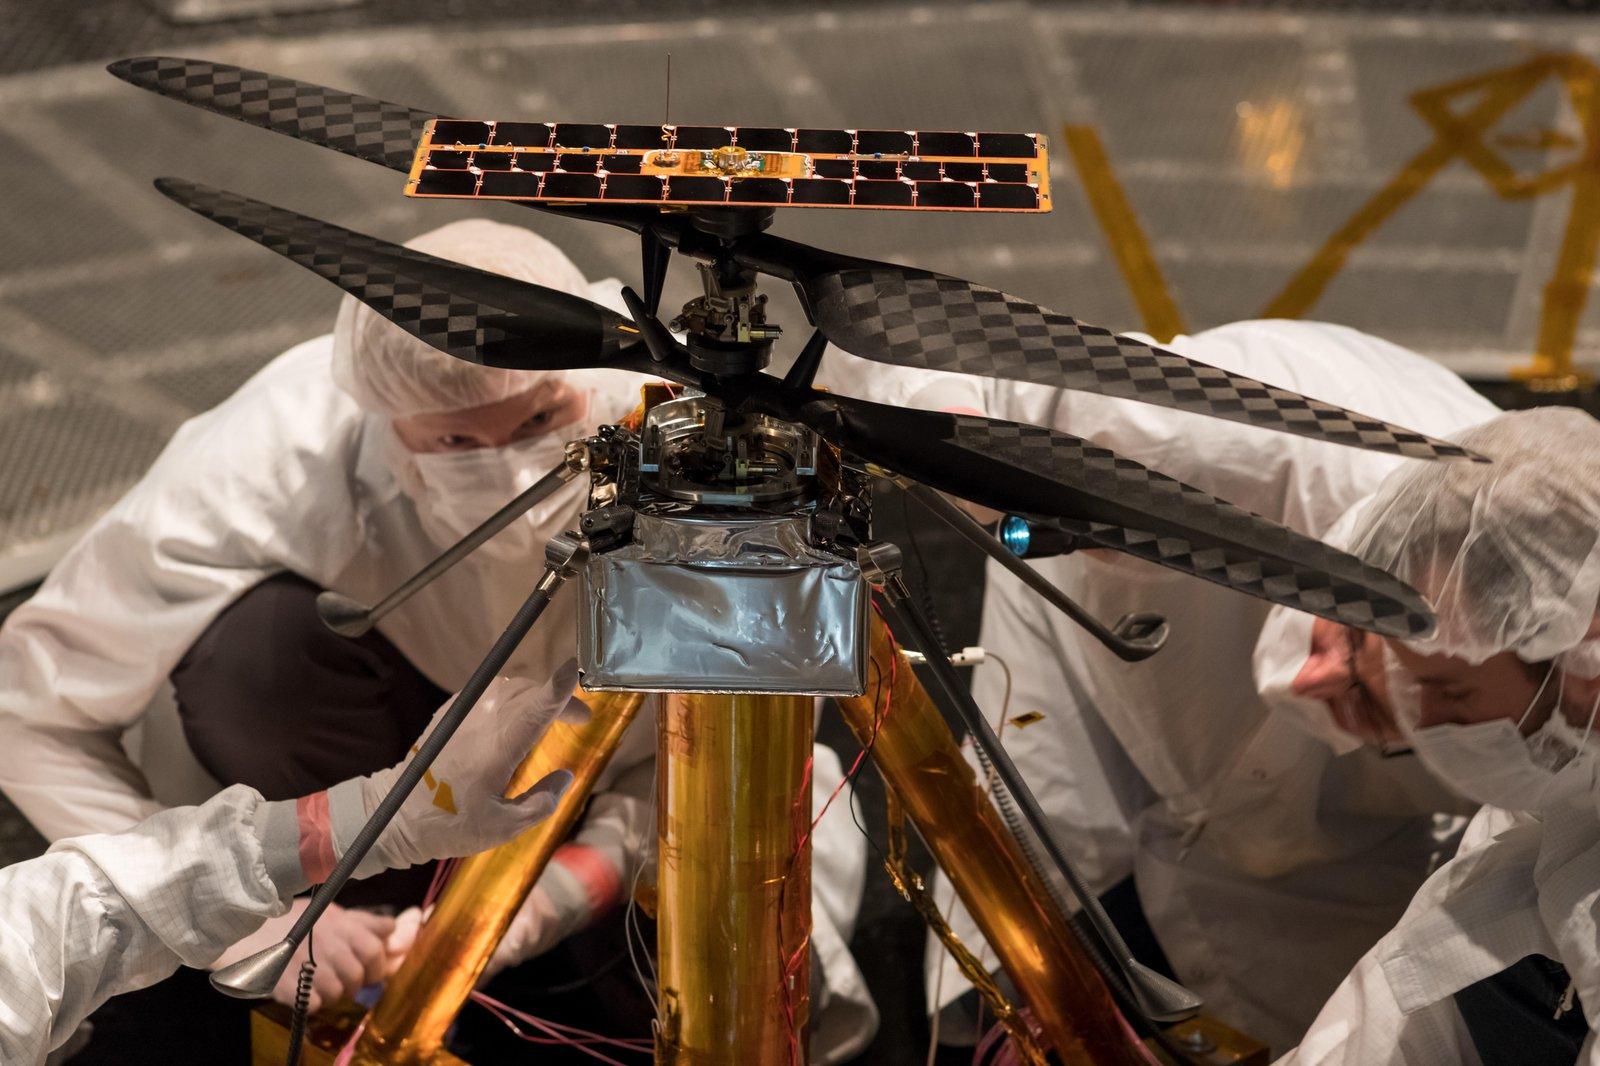 Drone development for Mars